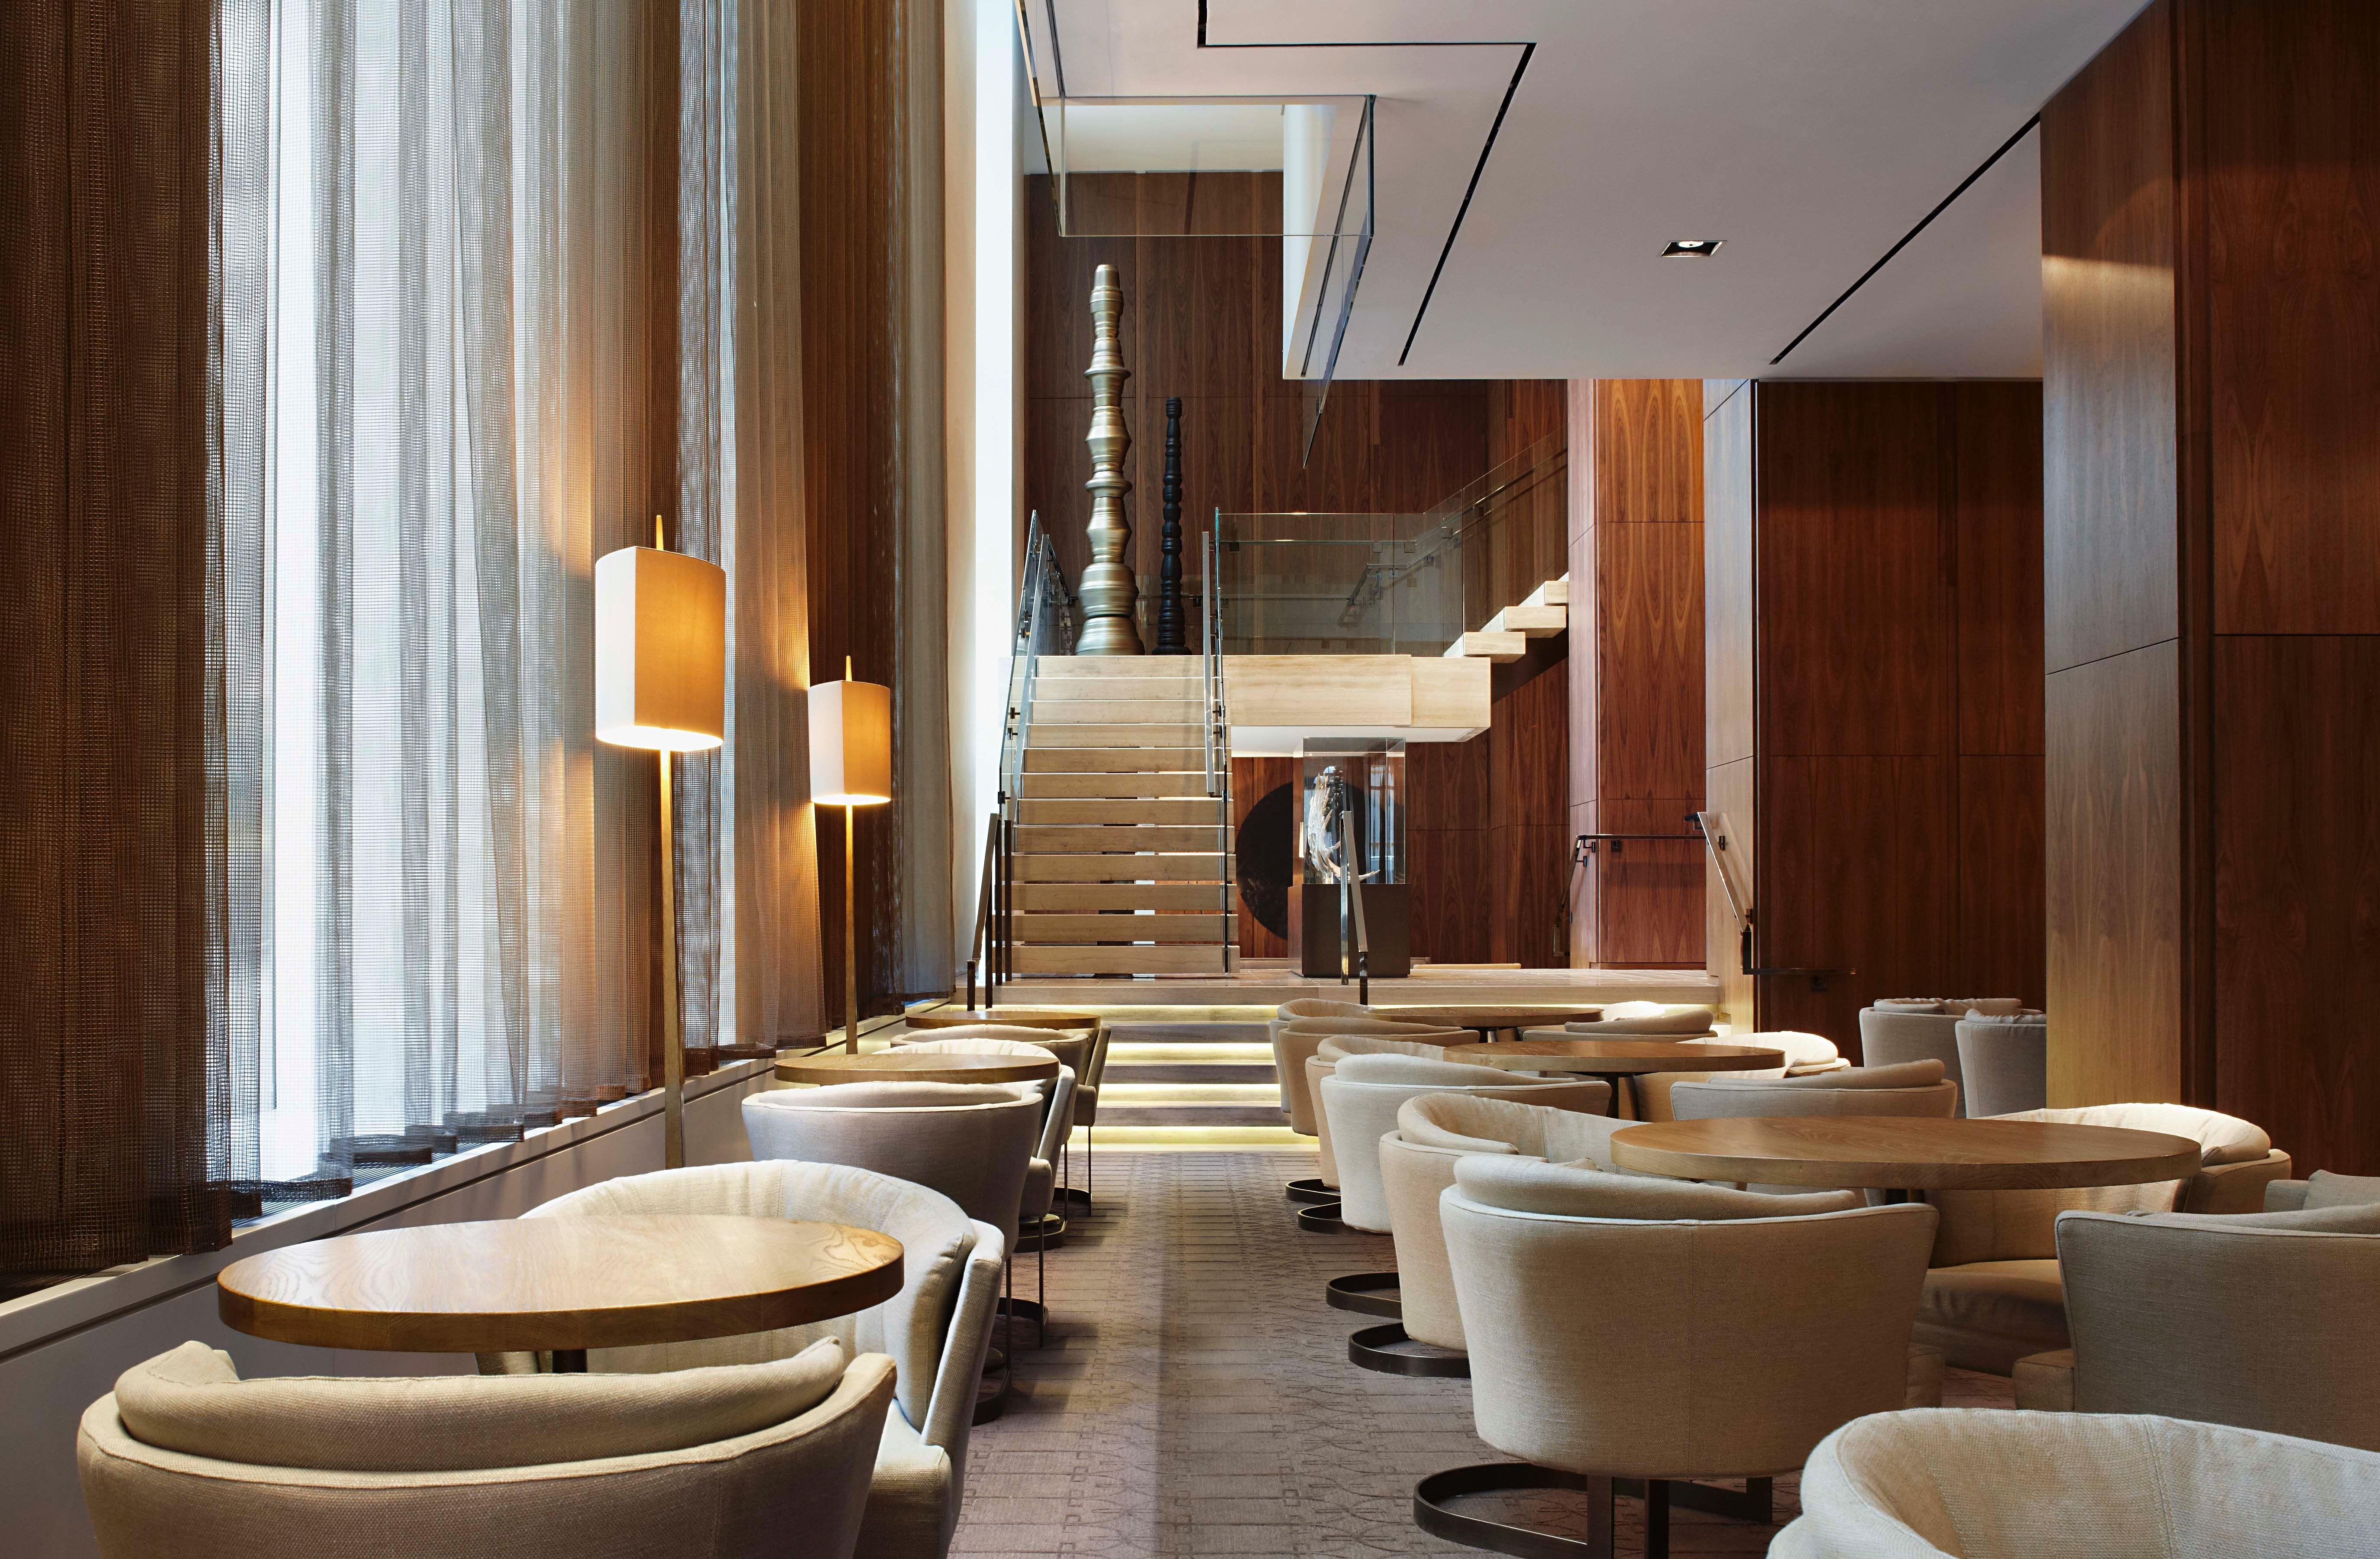 Four seasons toronto yabu pushelberg hotel lobby for Design hotel mosca